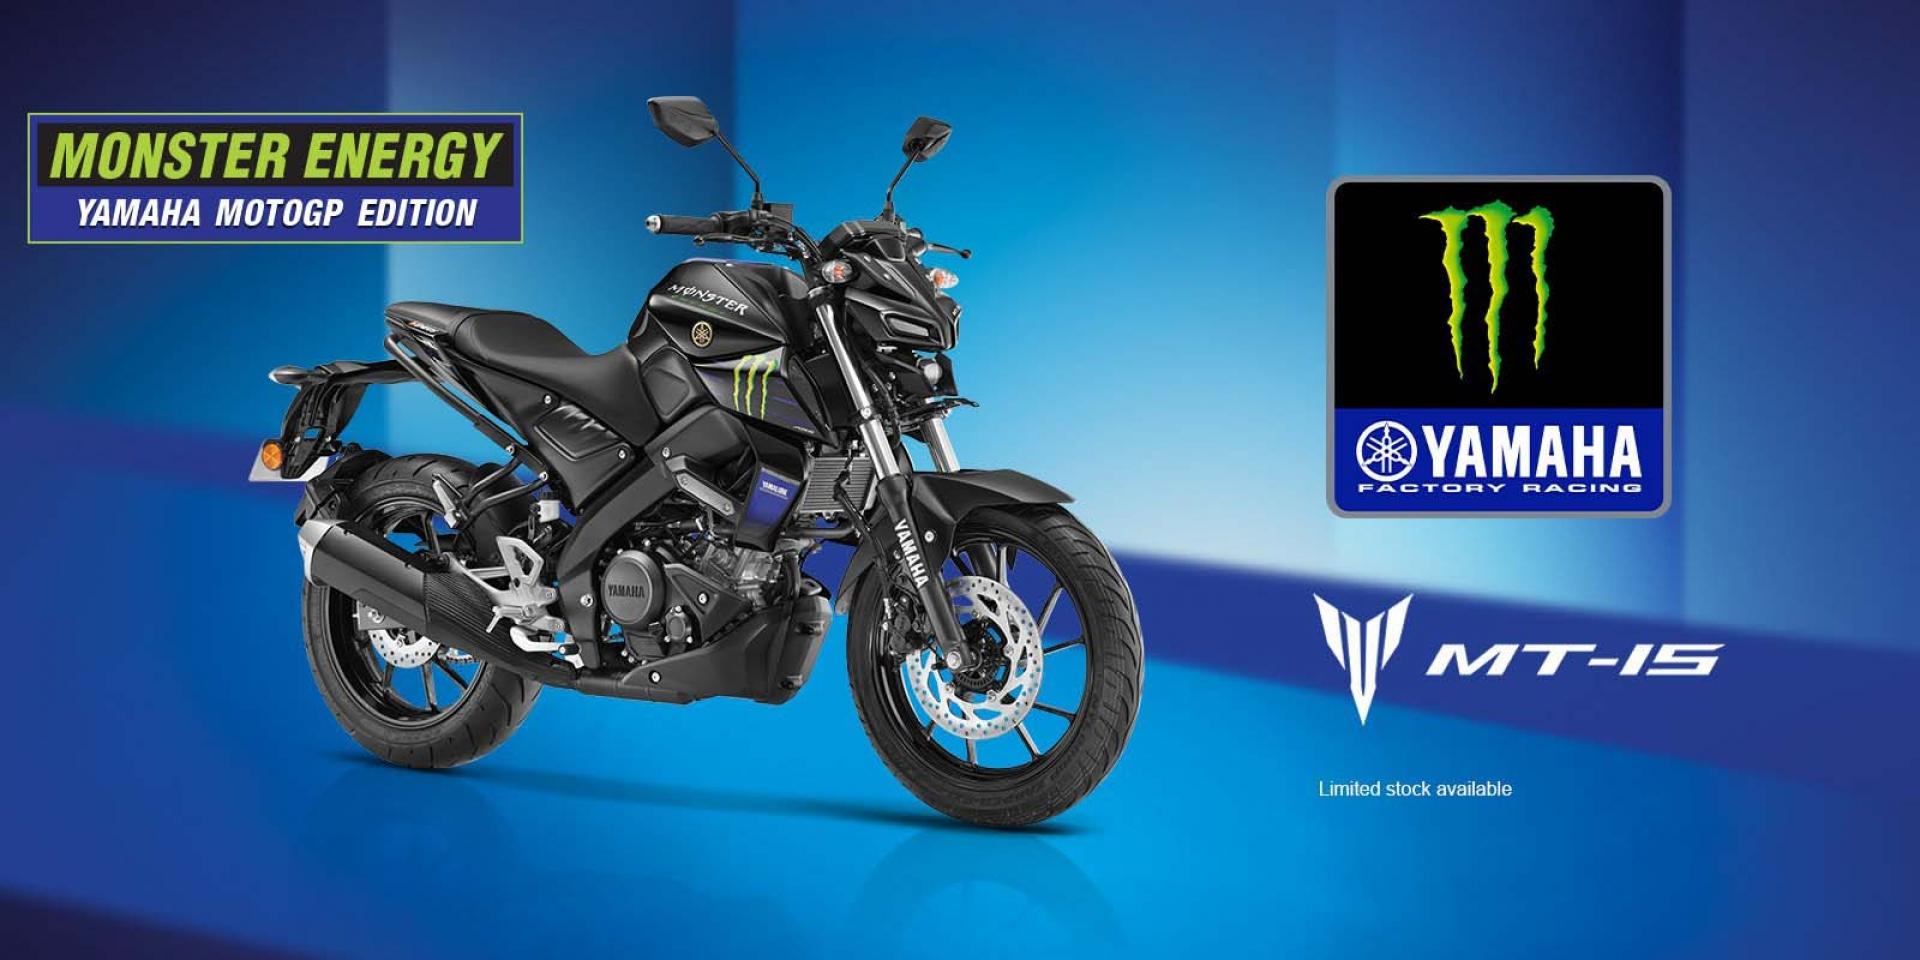 Monster Energy 廠隊塗裝上身 ! 2021 MT-15 MotoGP Edition